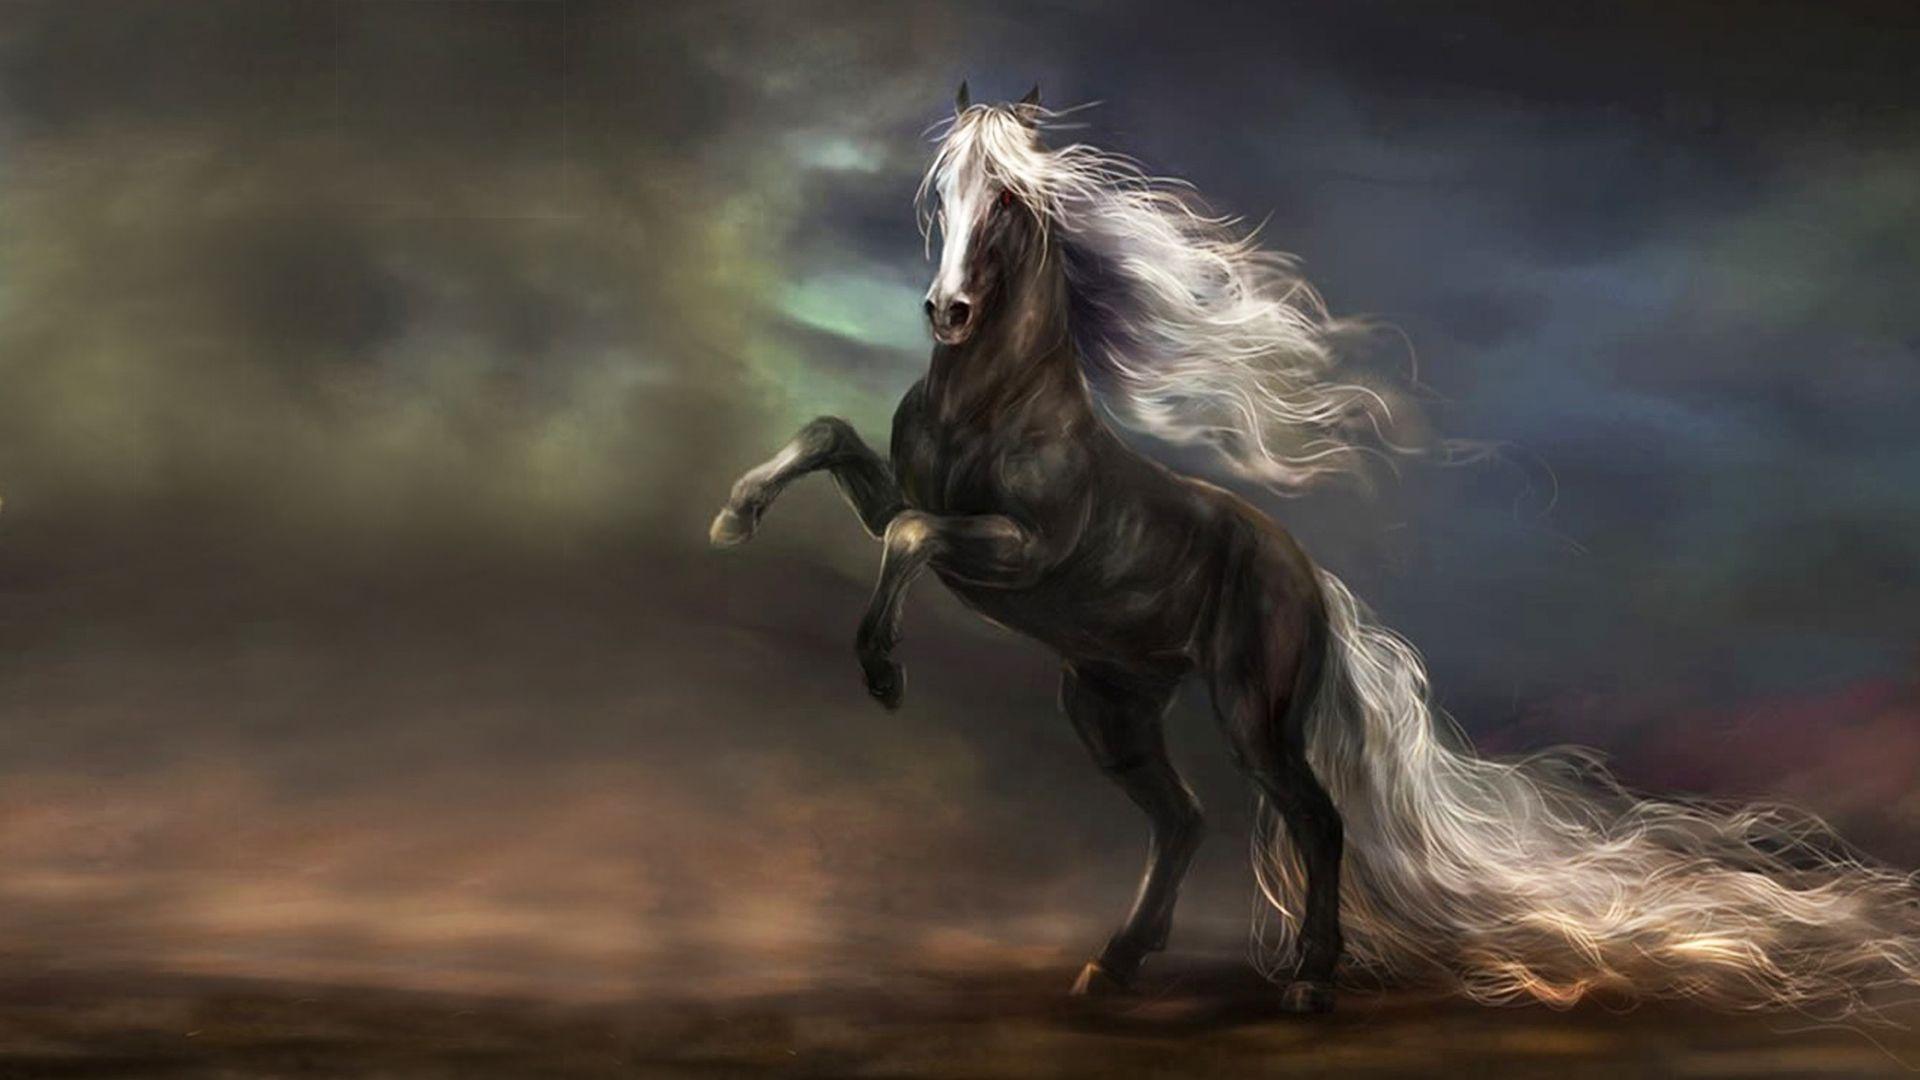 Fantasy horse kssarv pinterest fantasy horse voltagebd Images